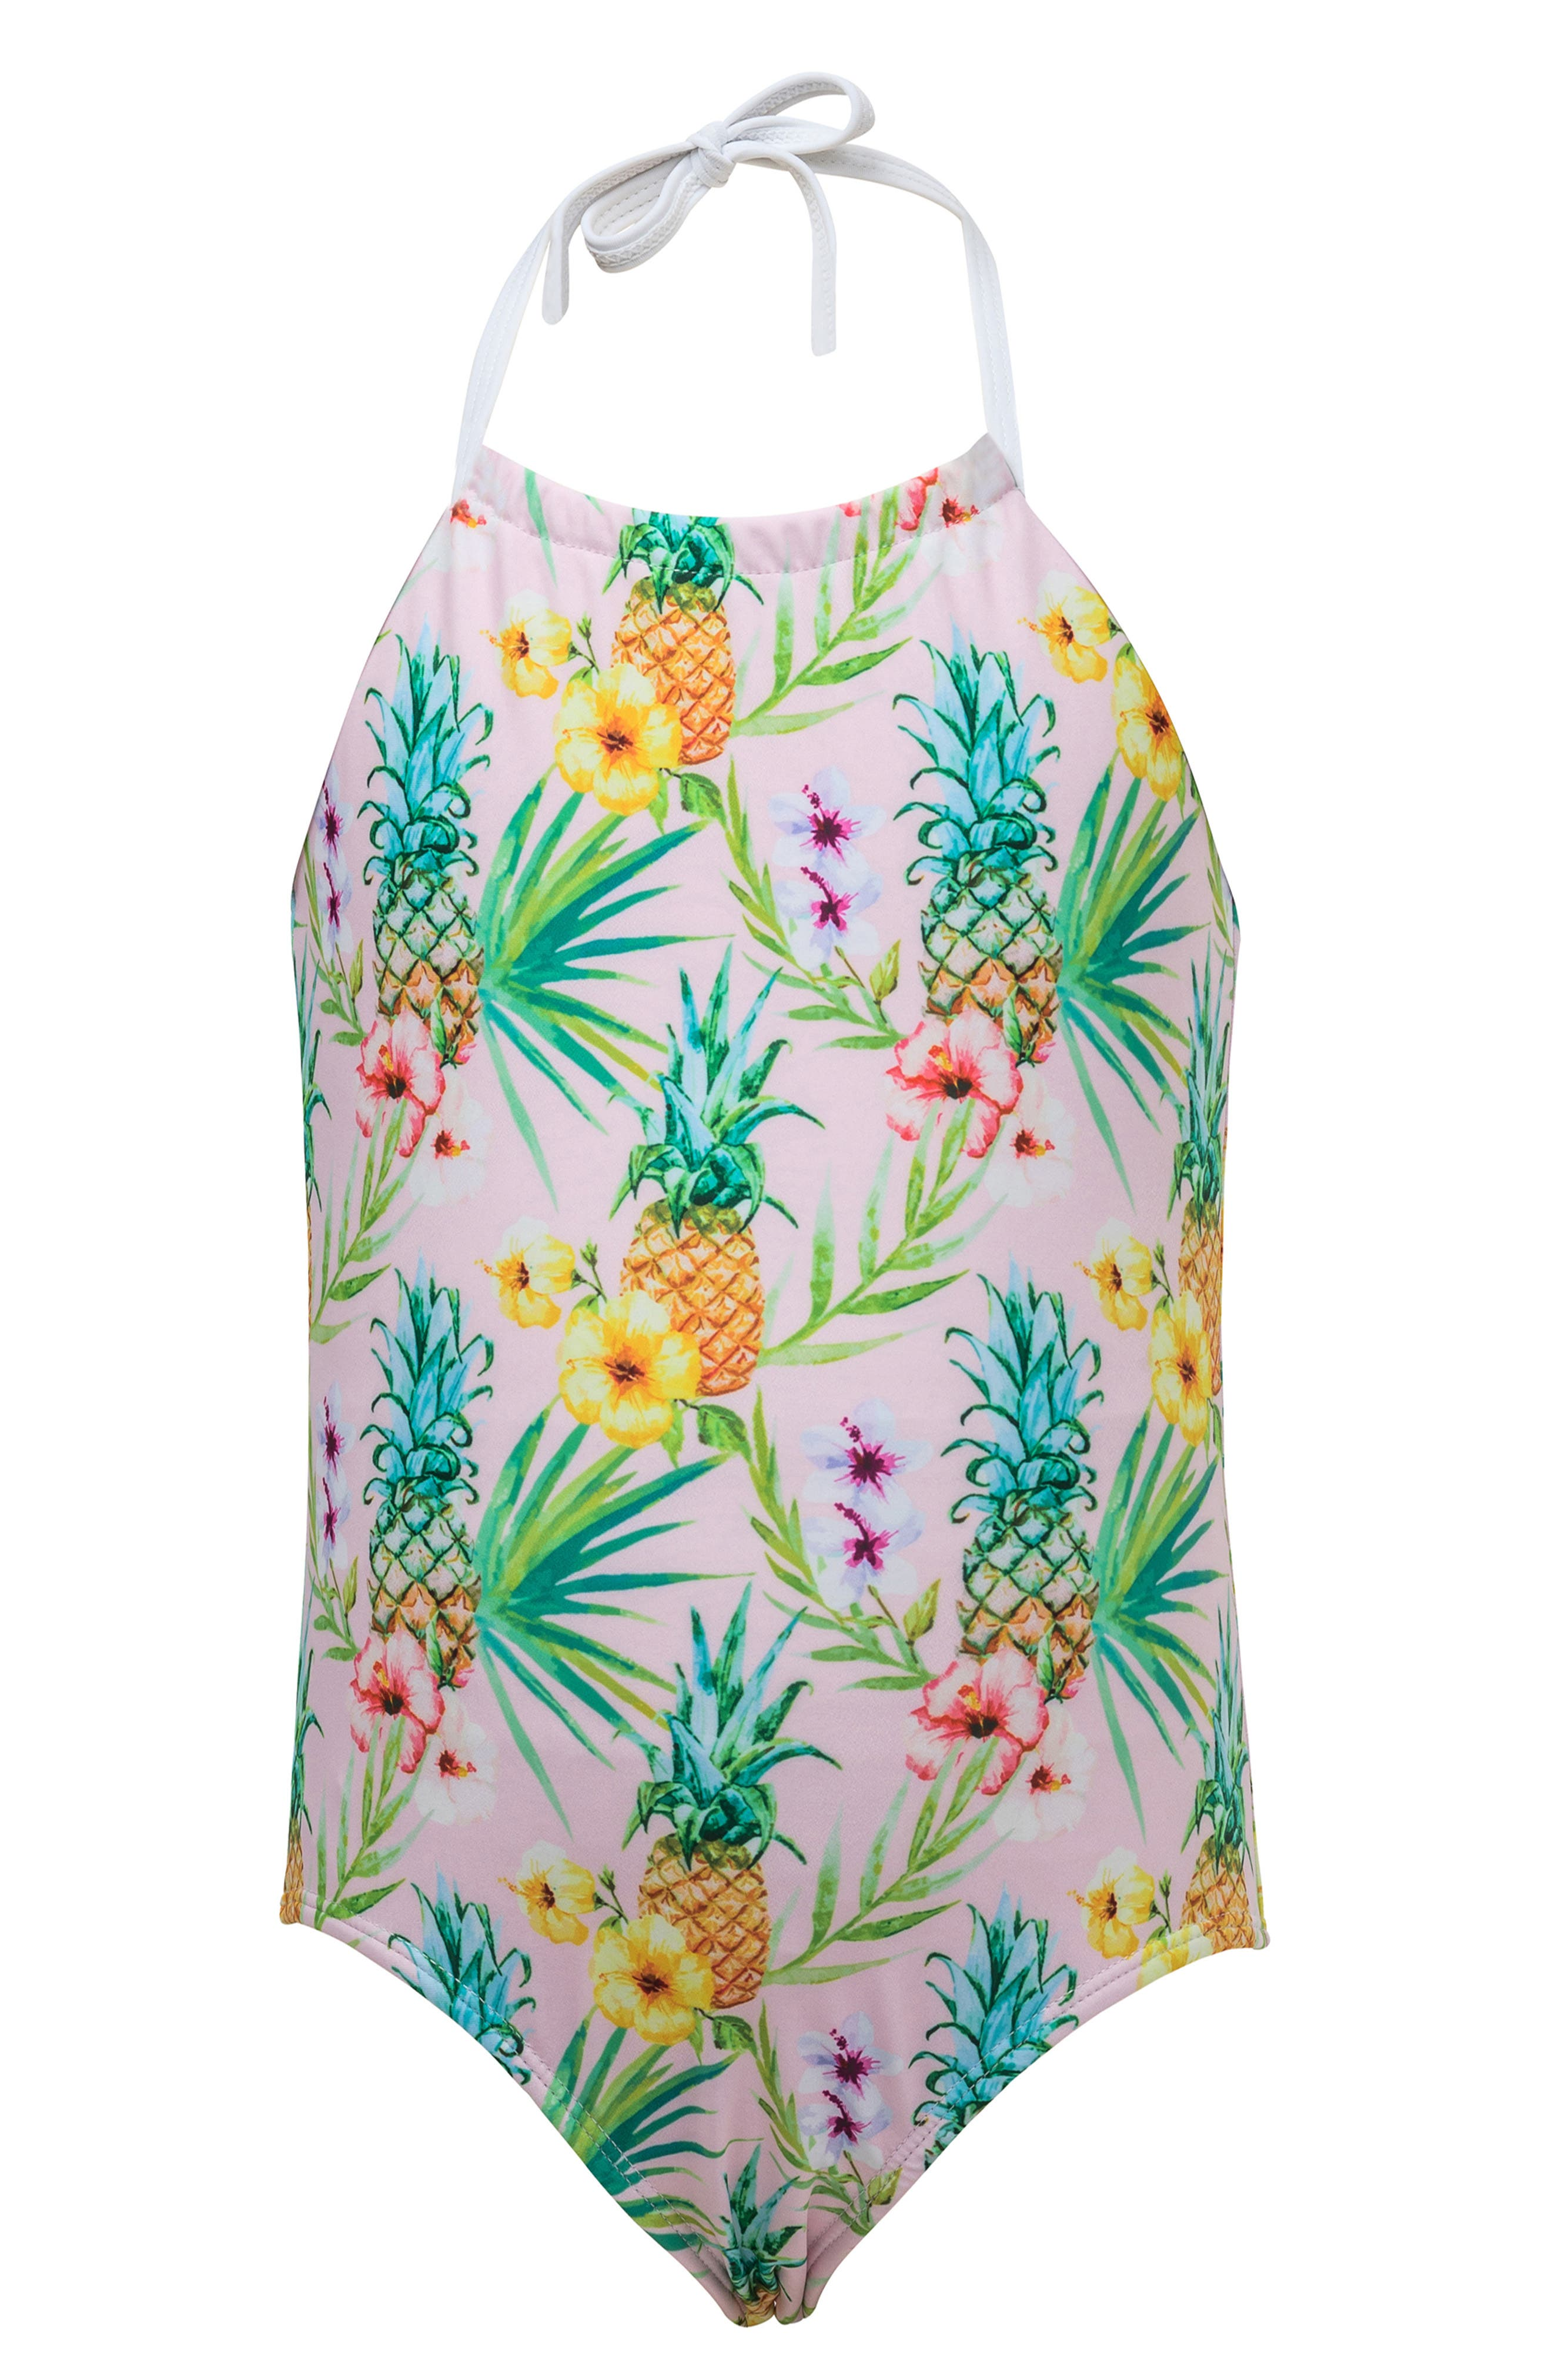 Pineapple One-Piece Halter Swimsuit,                         Main,                         color, PASTEL PINK MULTI